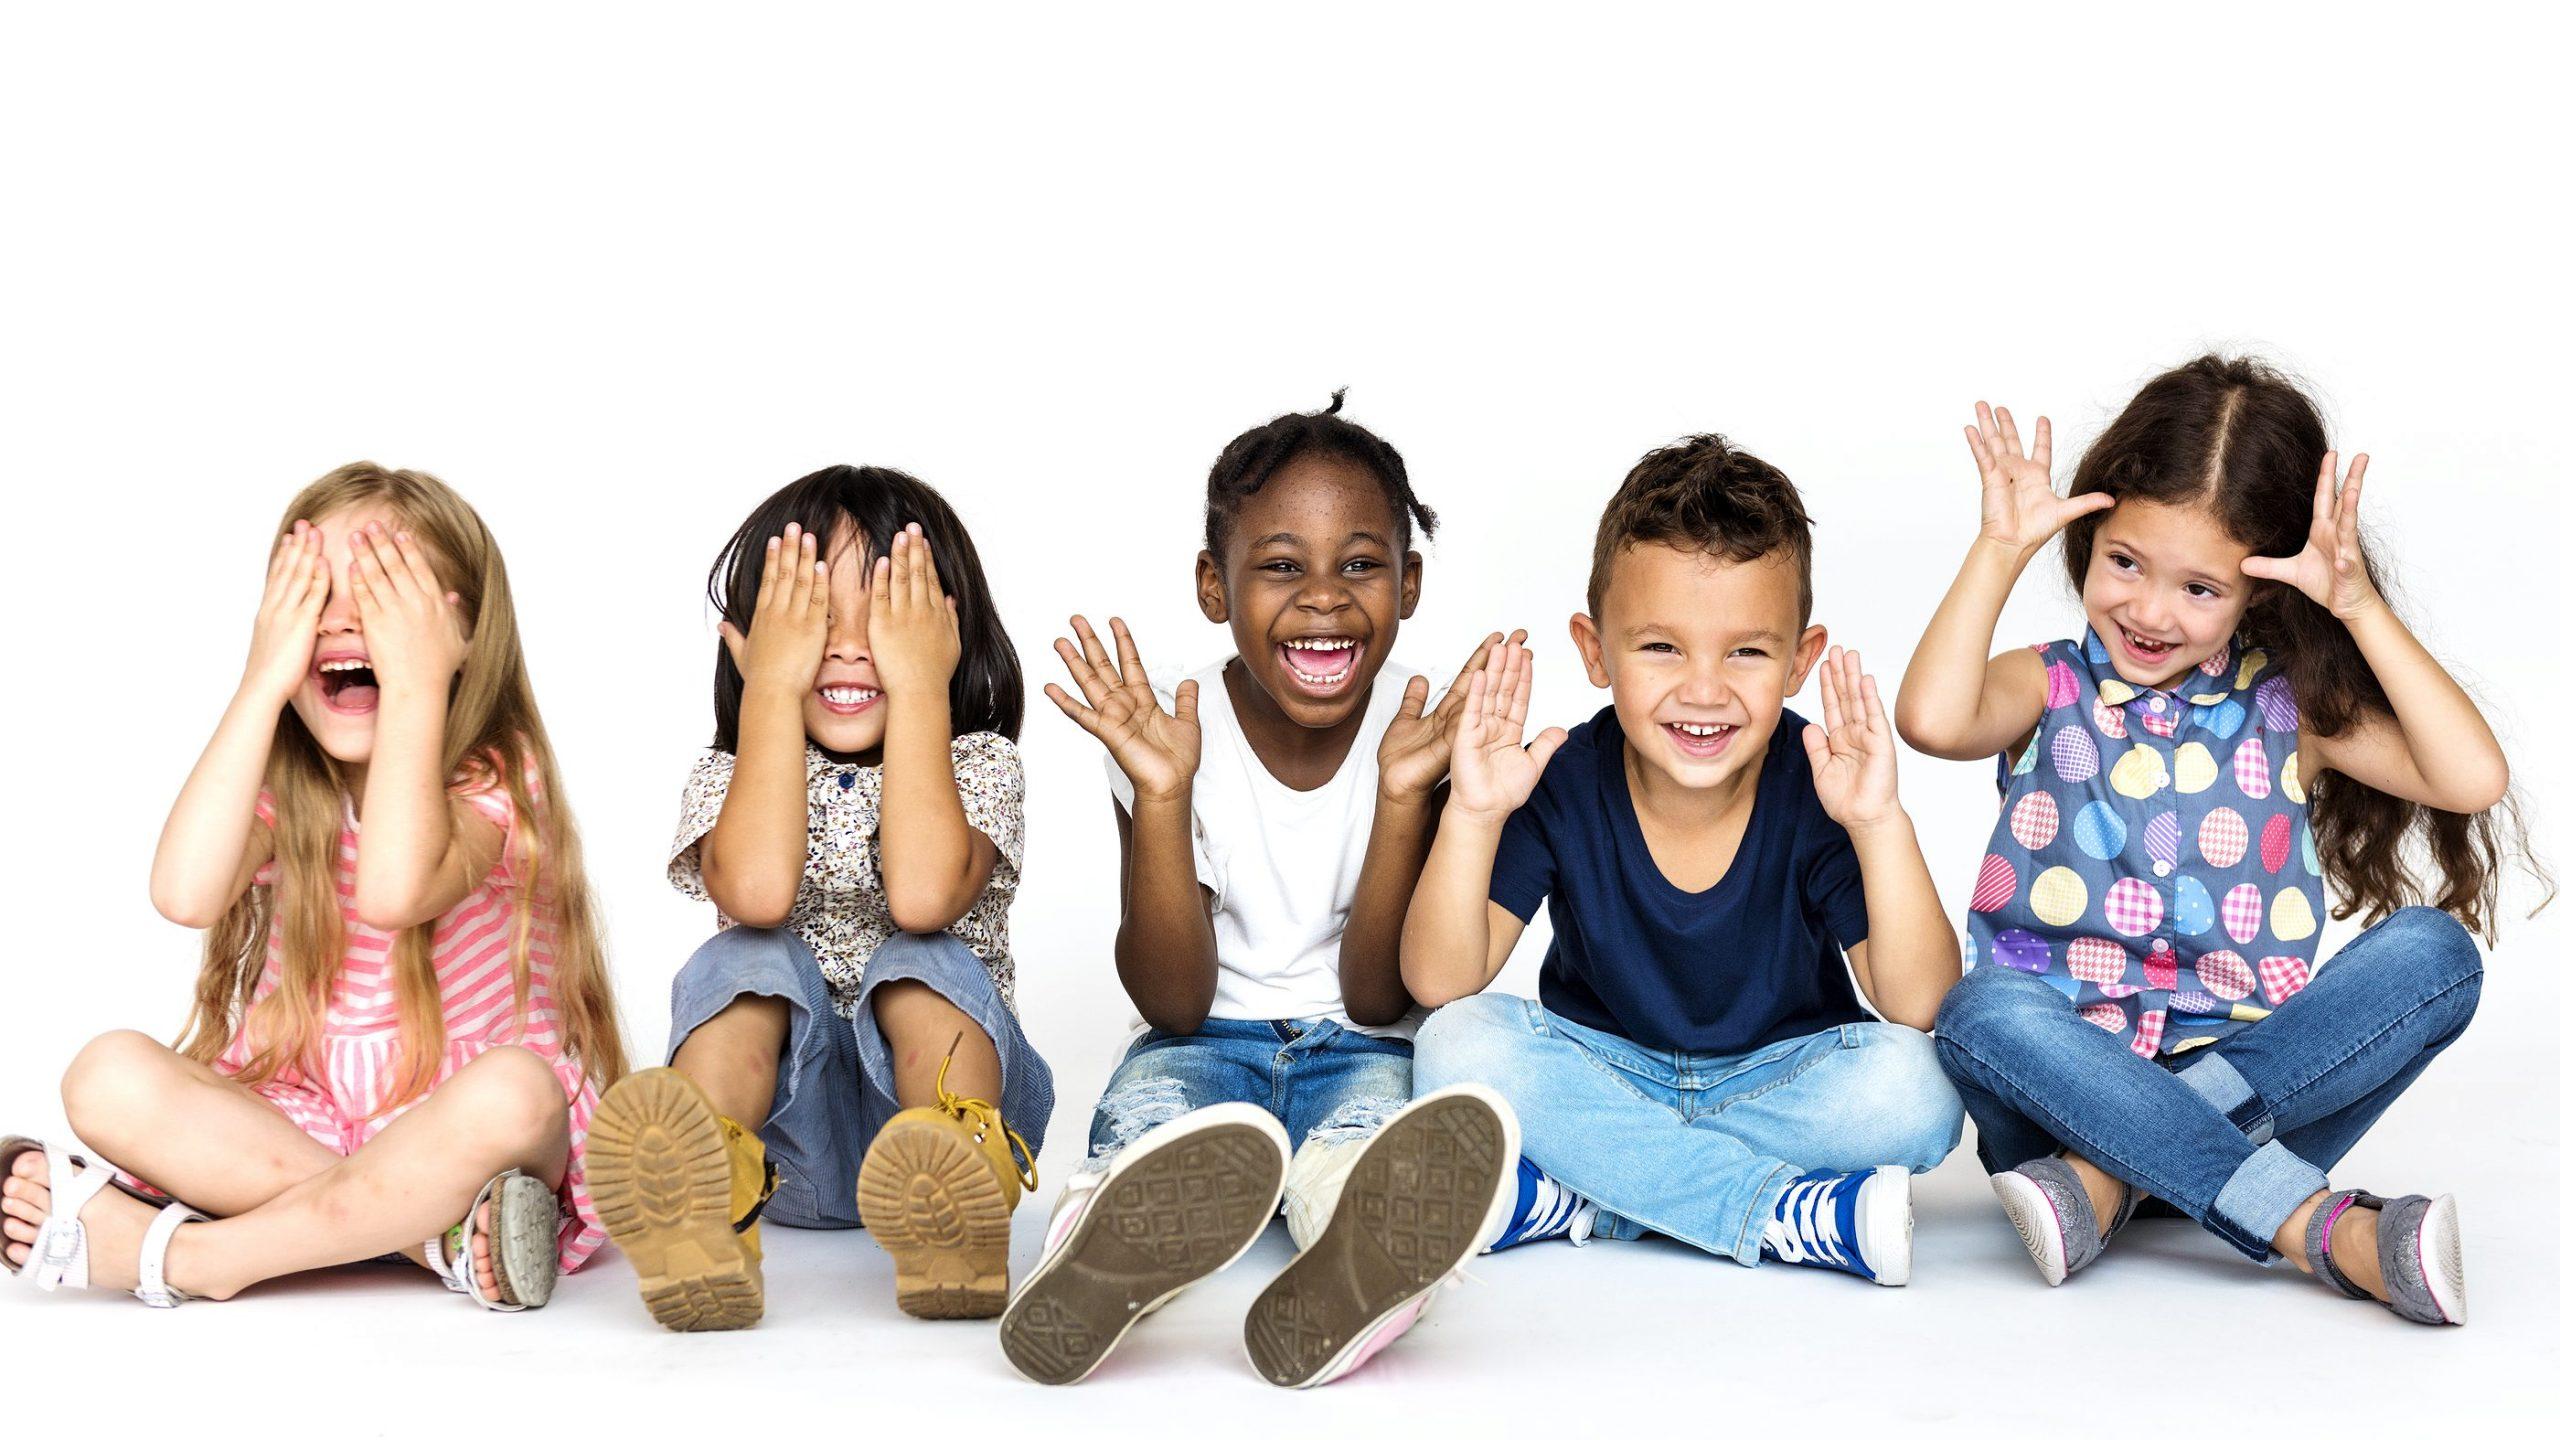 Diverse group of children doing peek a boo hand gesture